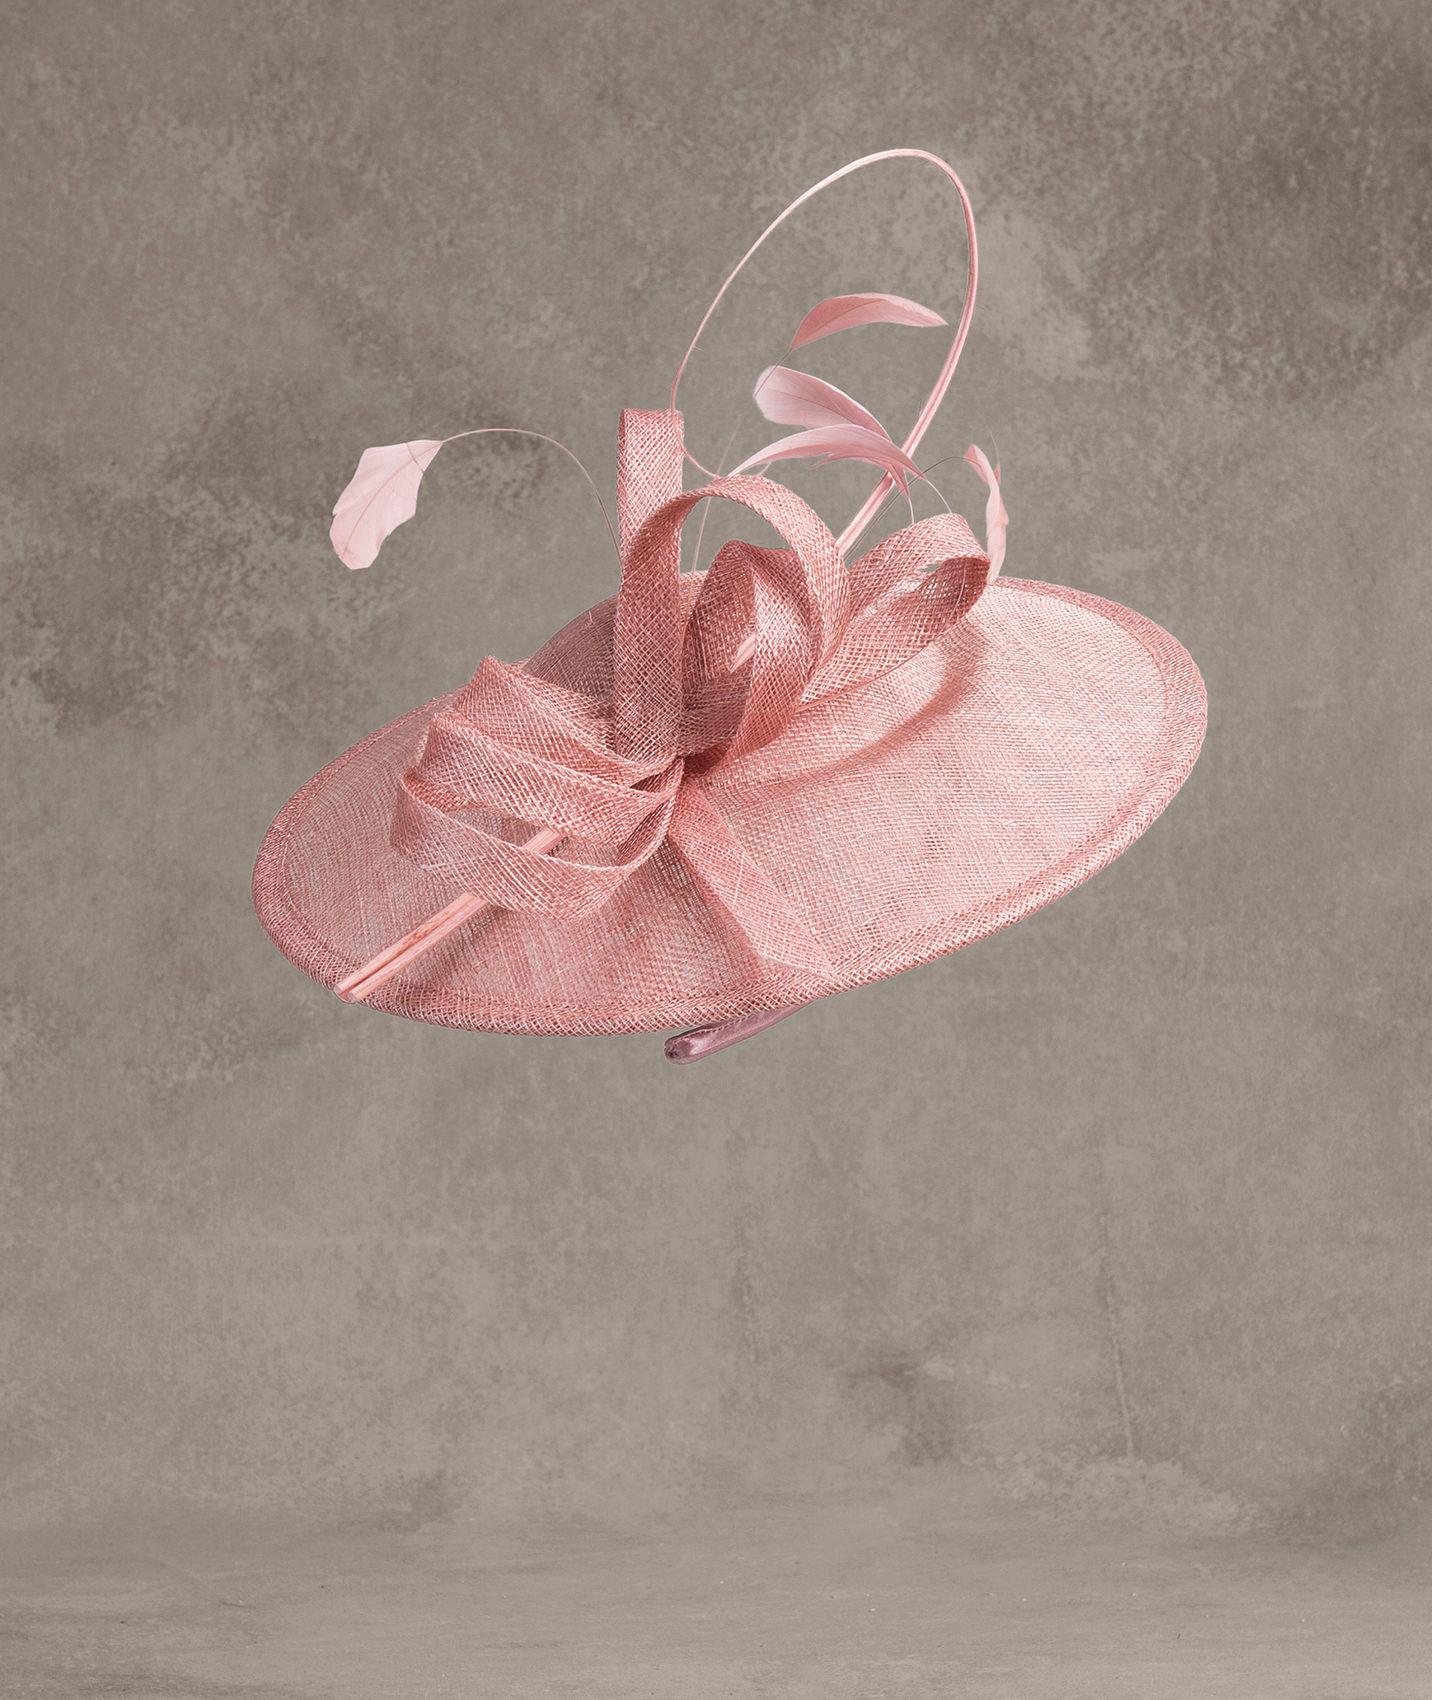 Cappello a larga tesa rosa in sinamay, piume e raso Pronovias